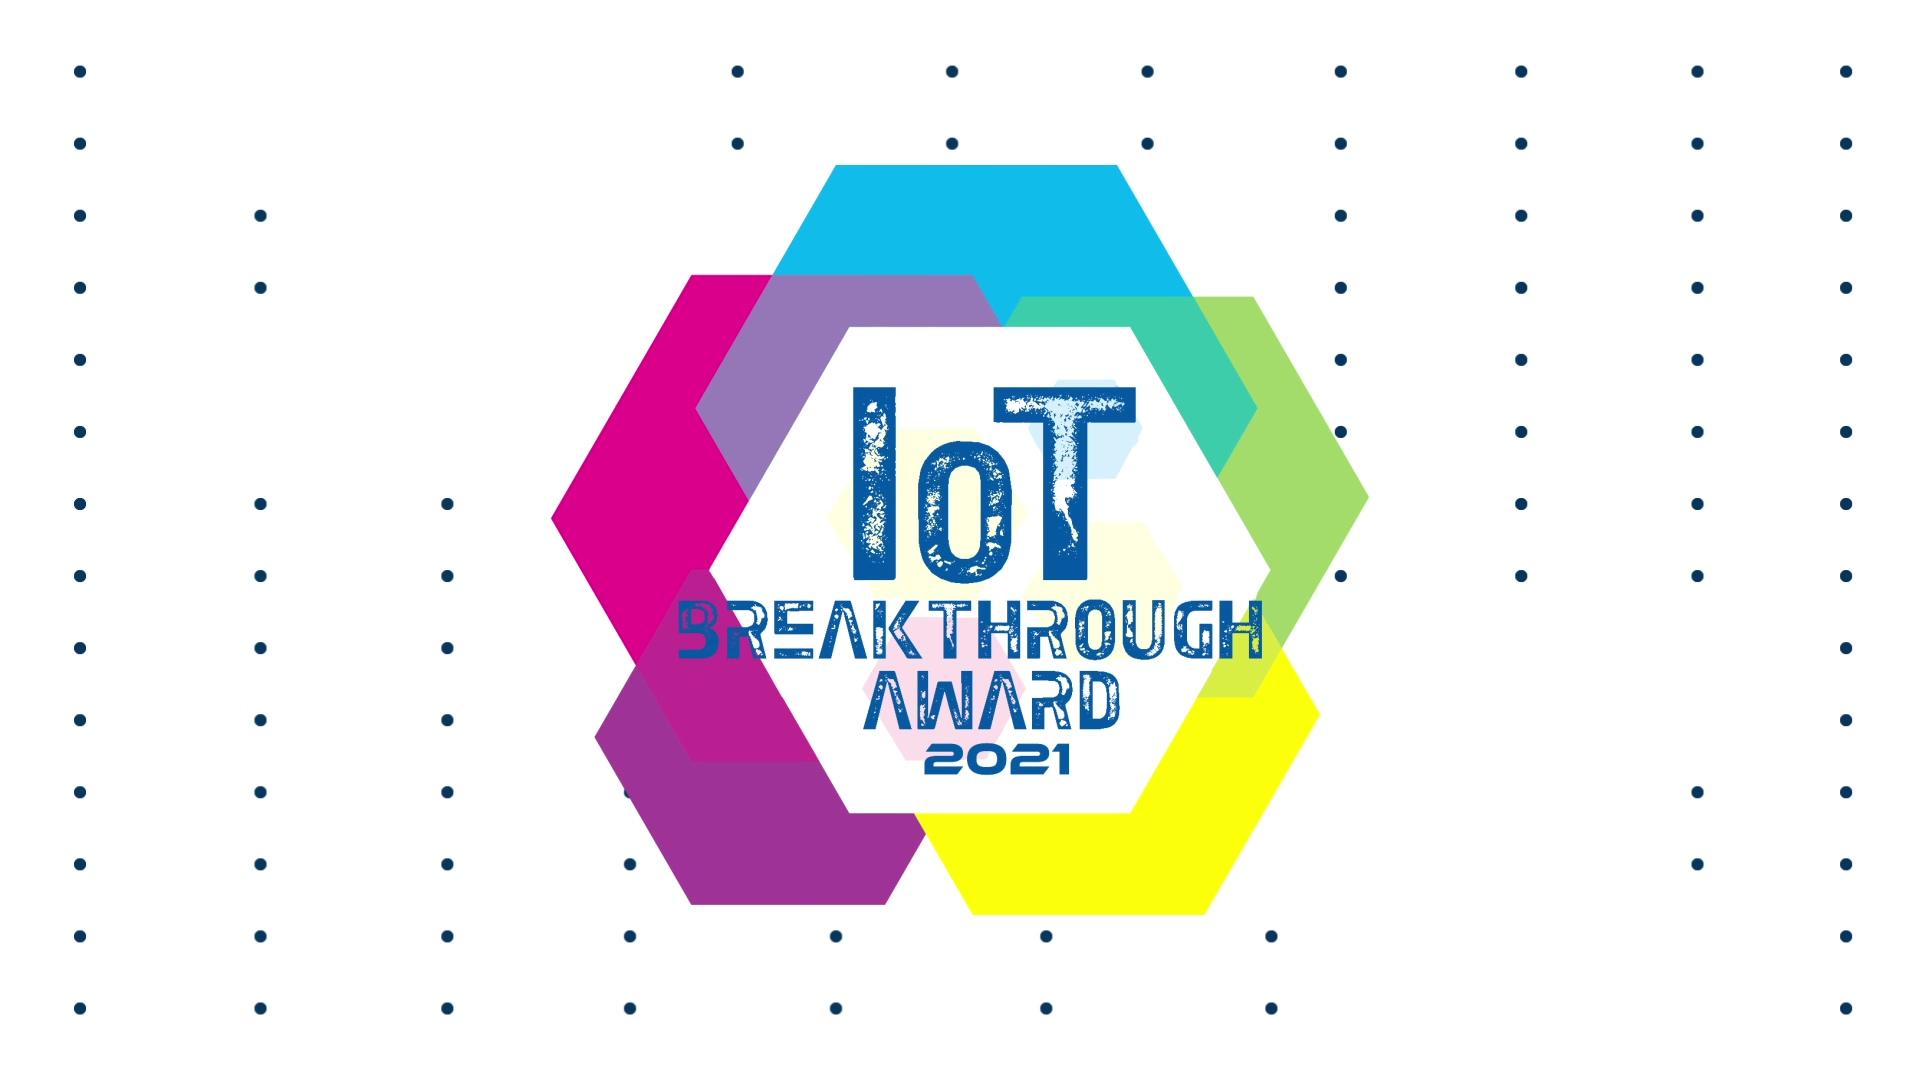 Very Awards Series IoT Breakthrough Awards 2021 v1